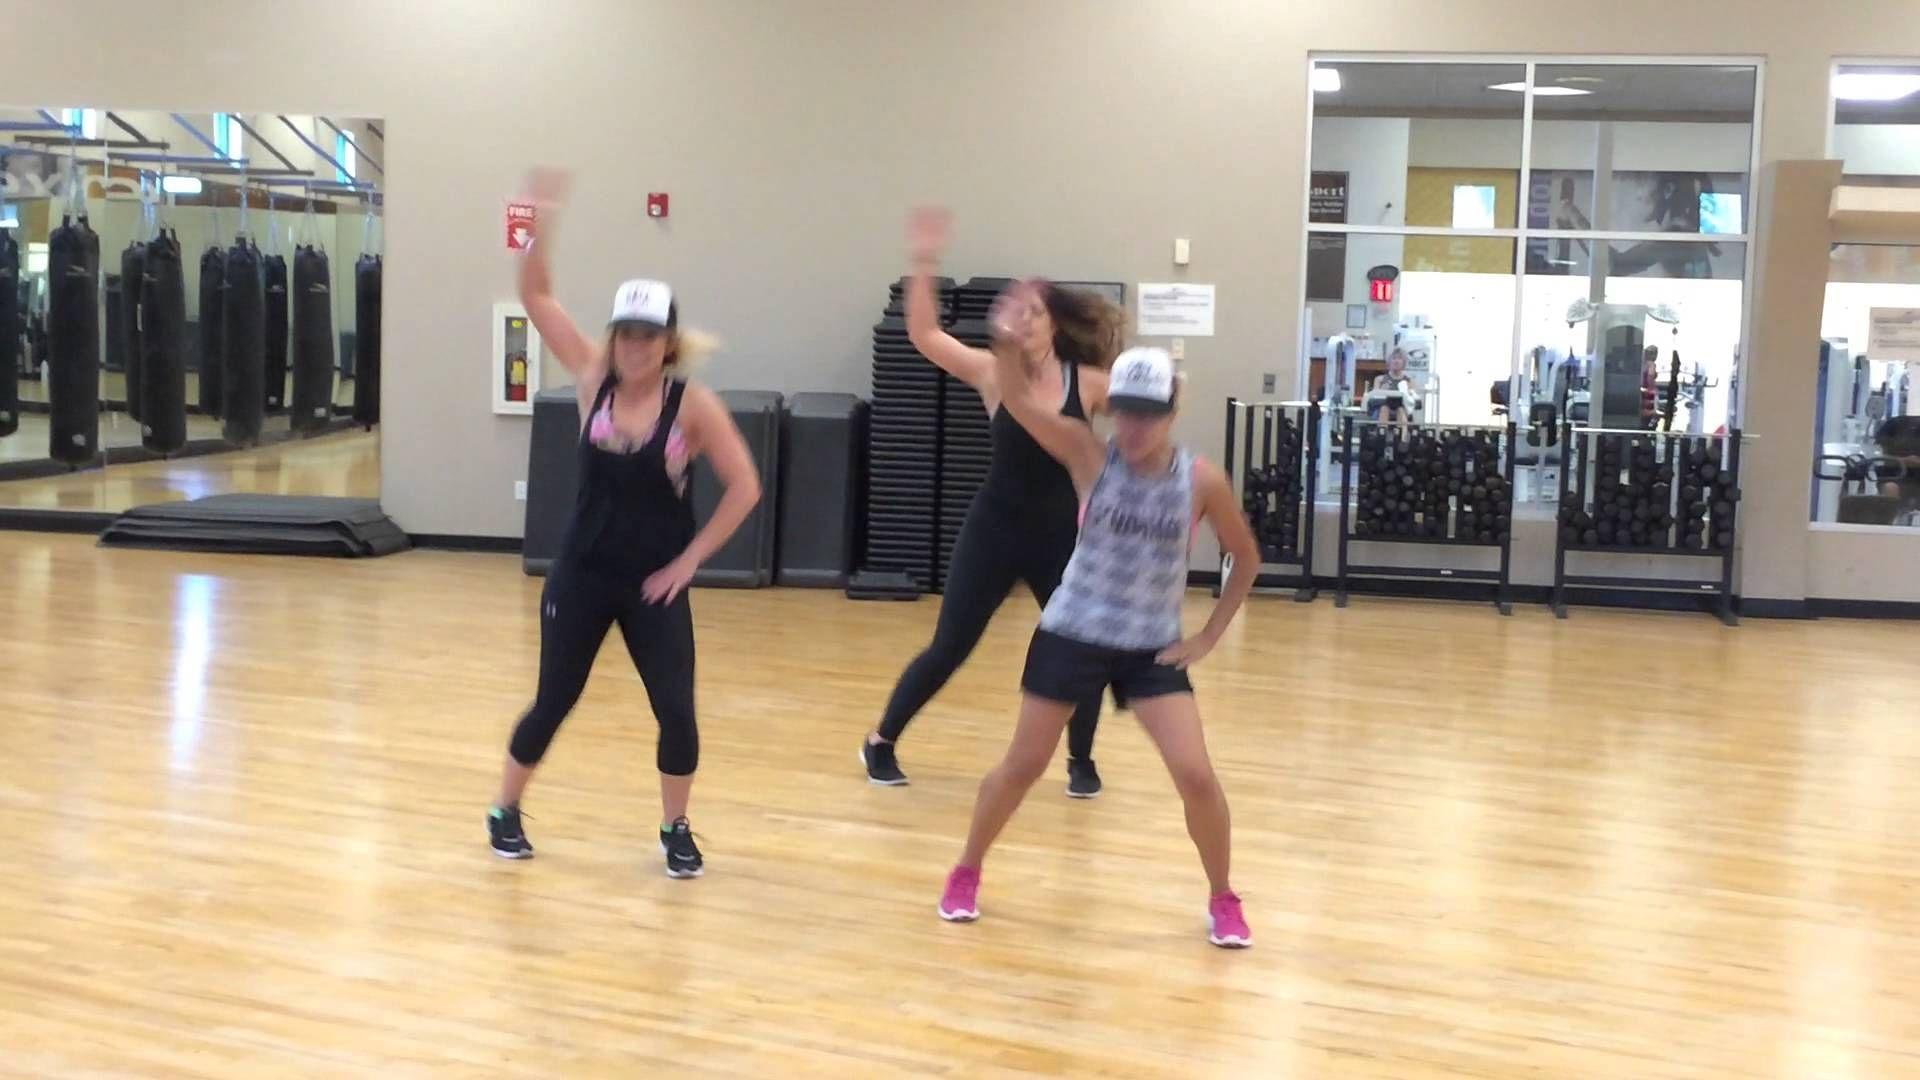 Zumba Shake It Warm Up By Luke Skies Feat Max C Featured On Mega Mix 41 Choreography By Nicole Dance With Purpose For E Zumba Zumba Warm Up Dance Workout